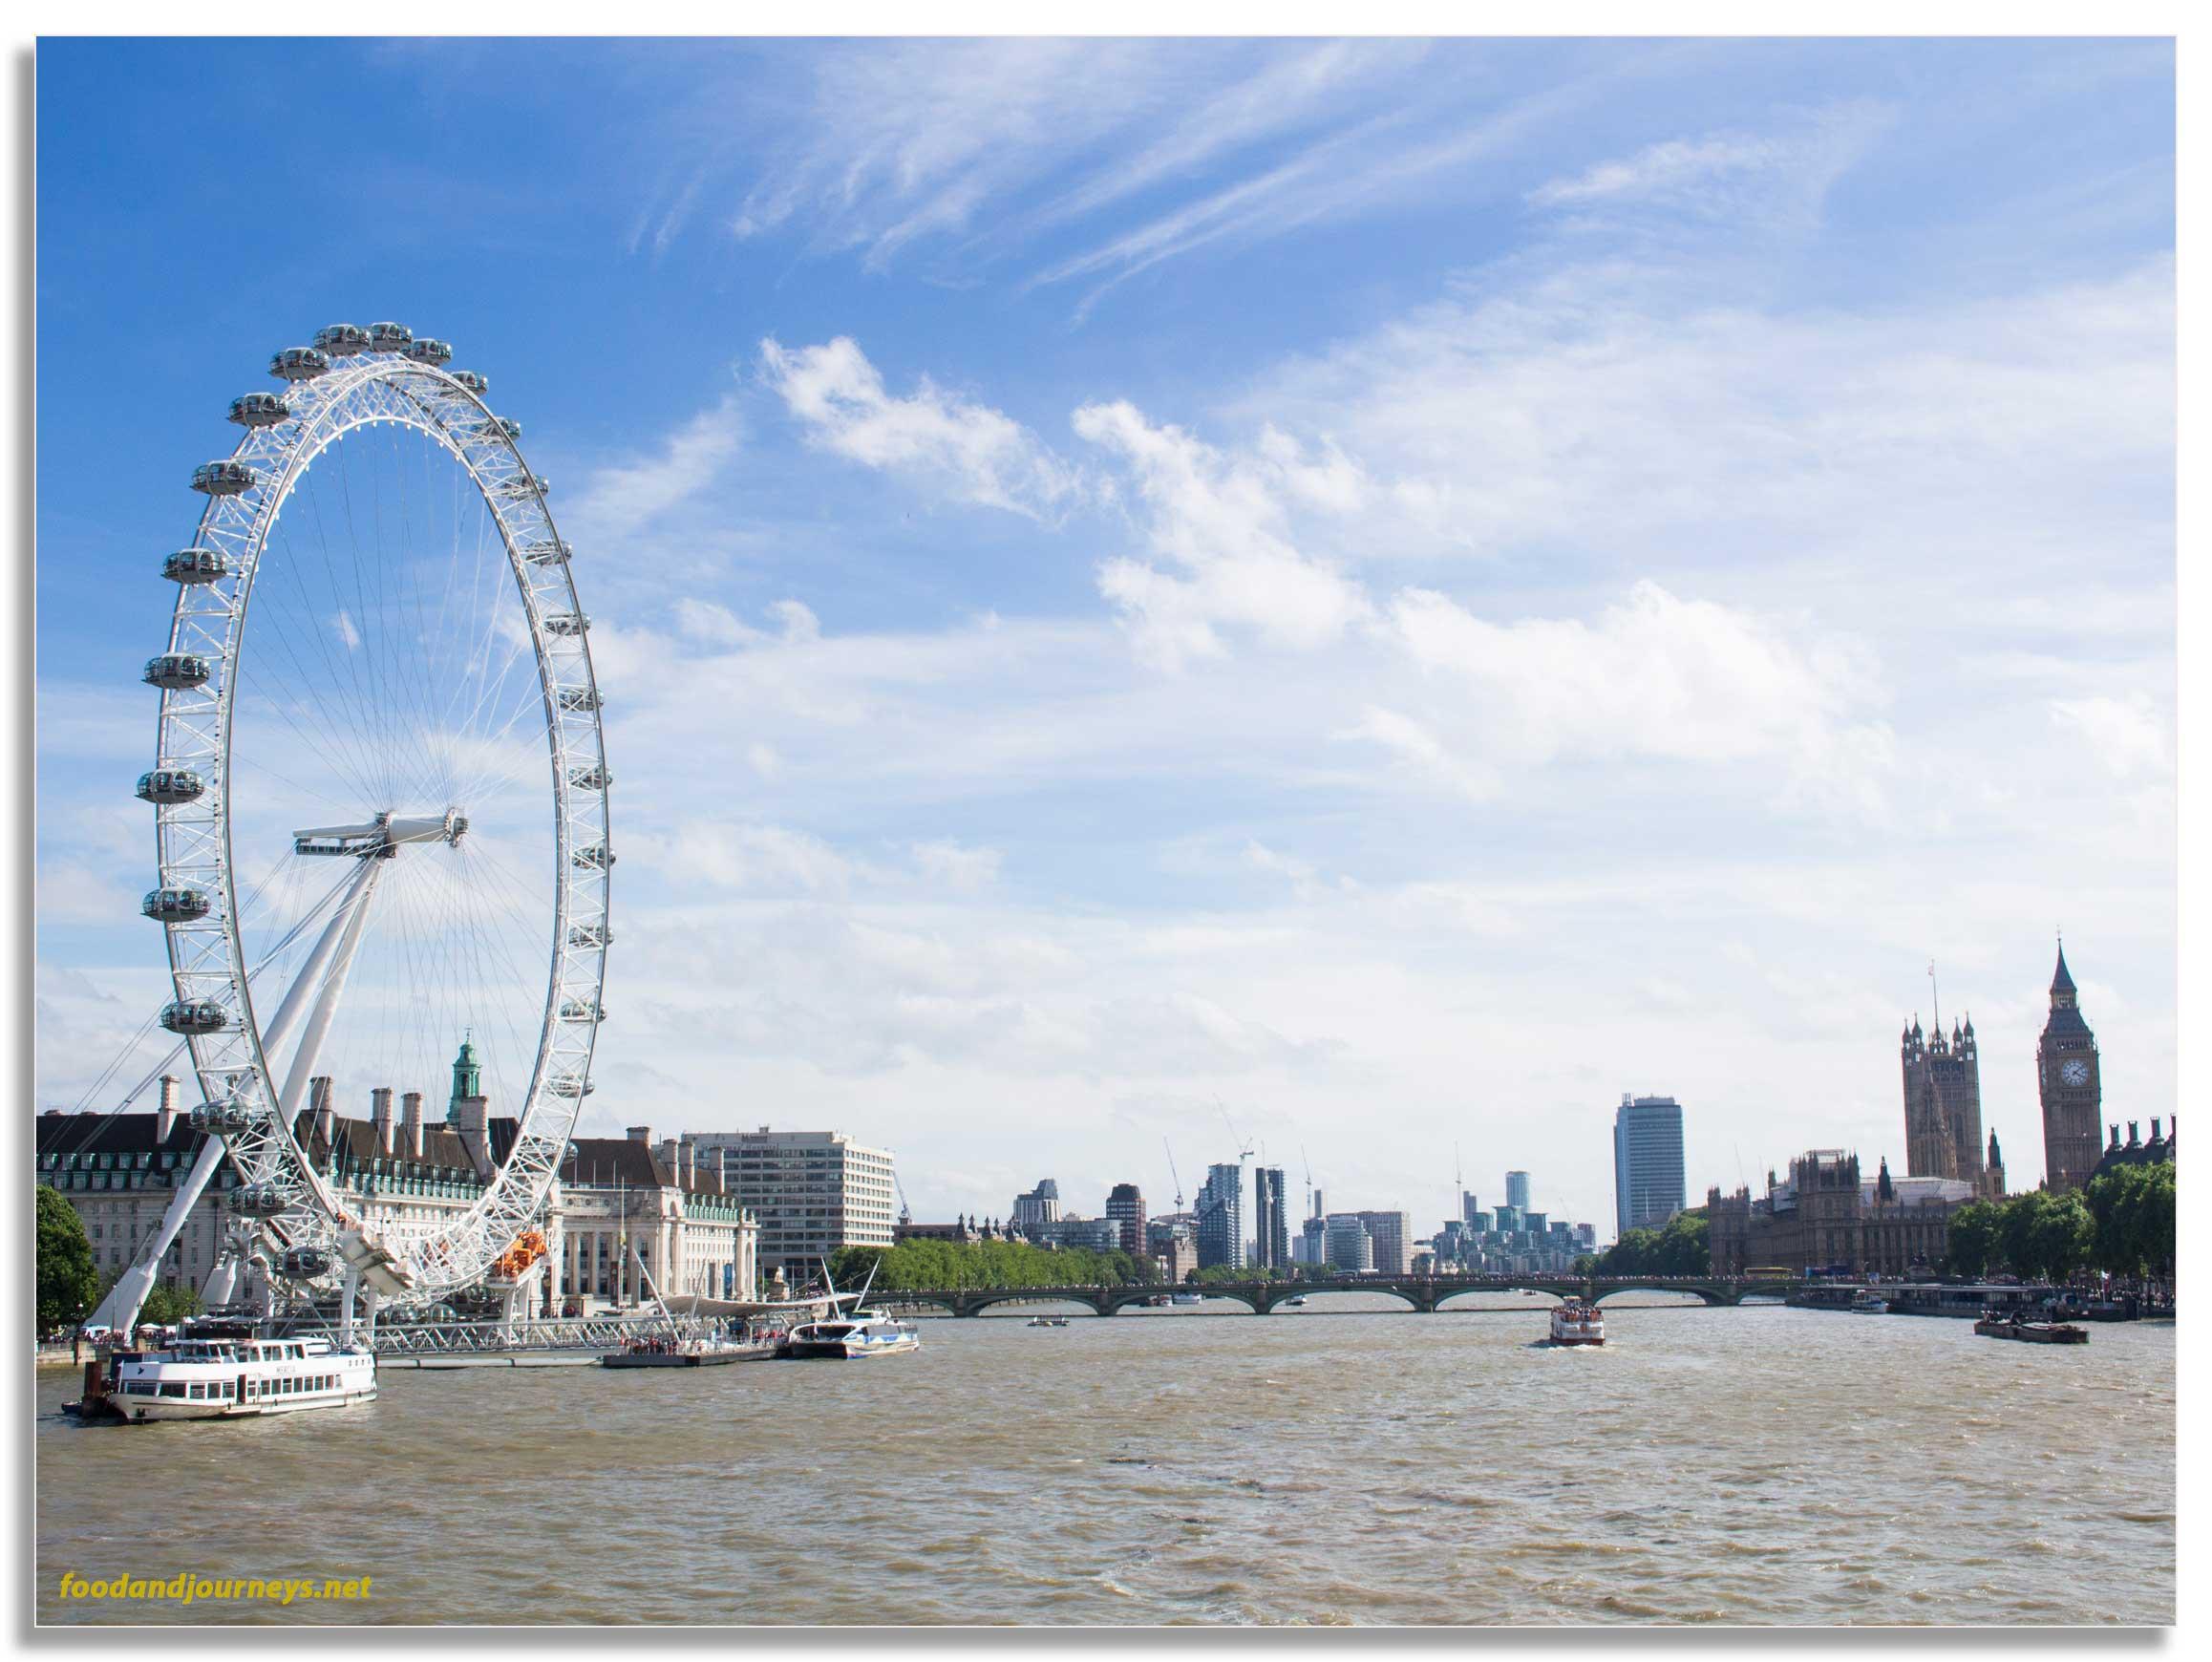 Millenium Wheel London|foodandjourneys.net